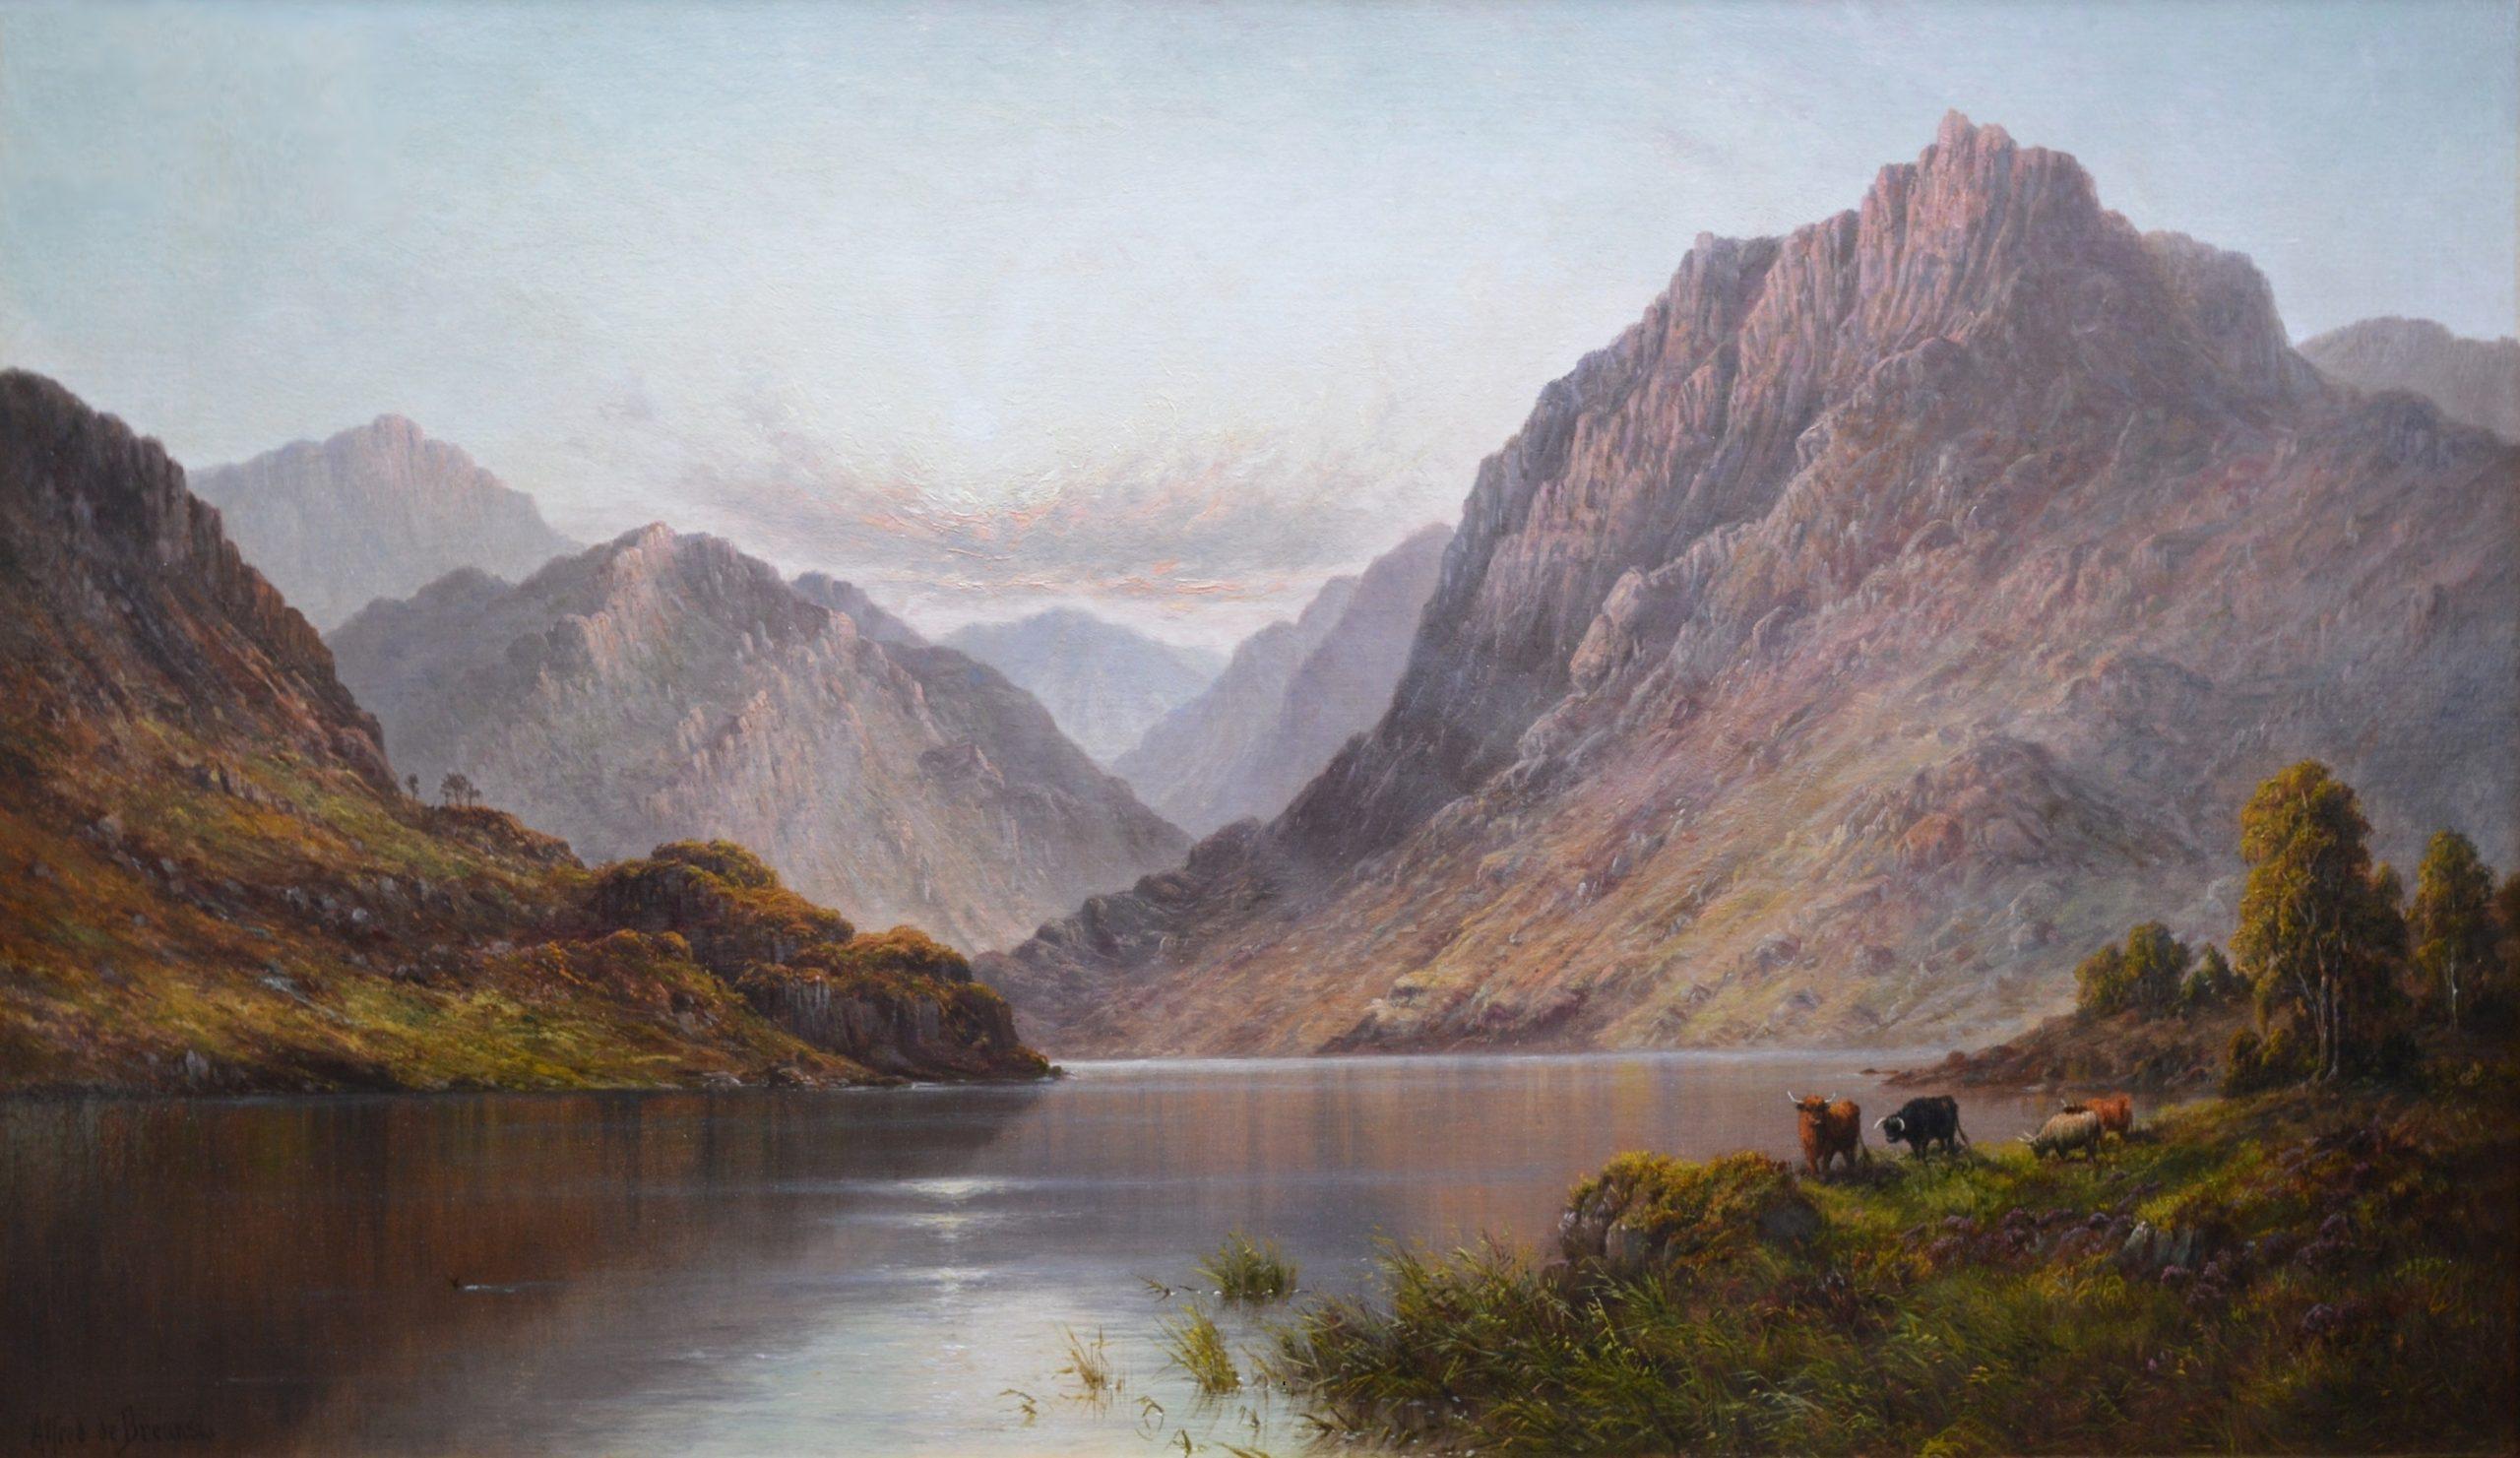 Loch Lomond - Large 19th Century Scottish Highlands Oil Painting Image